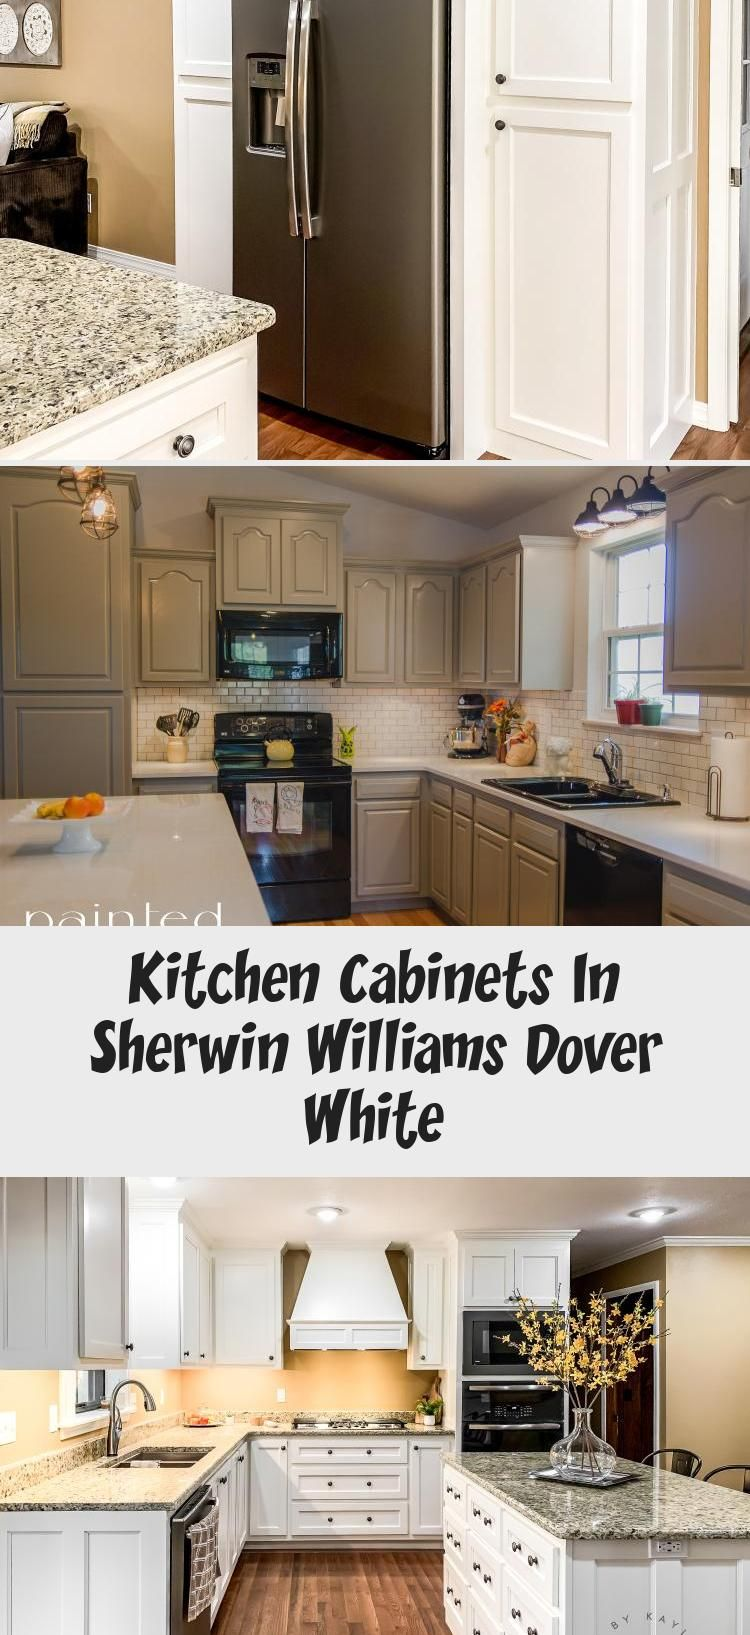 Kitchen Cabinets In Sherwin Williams Dover White | Sherwin ...